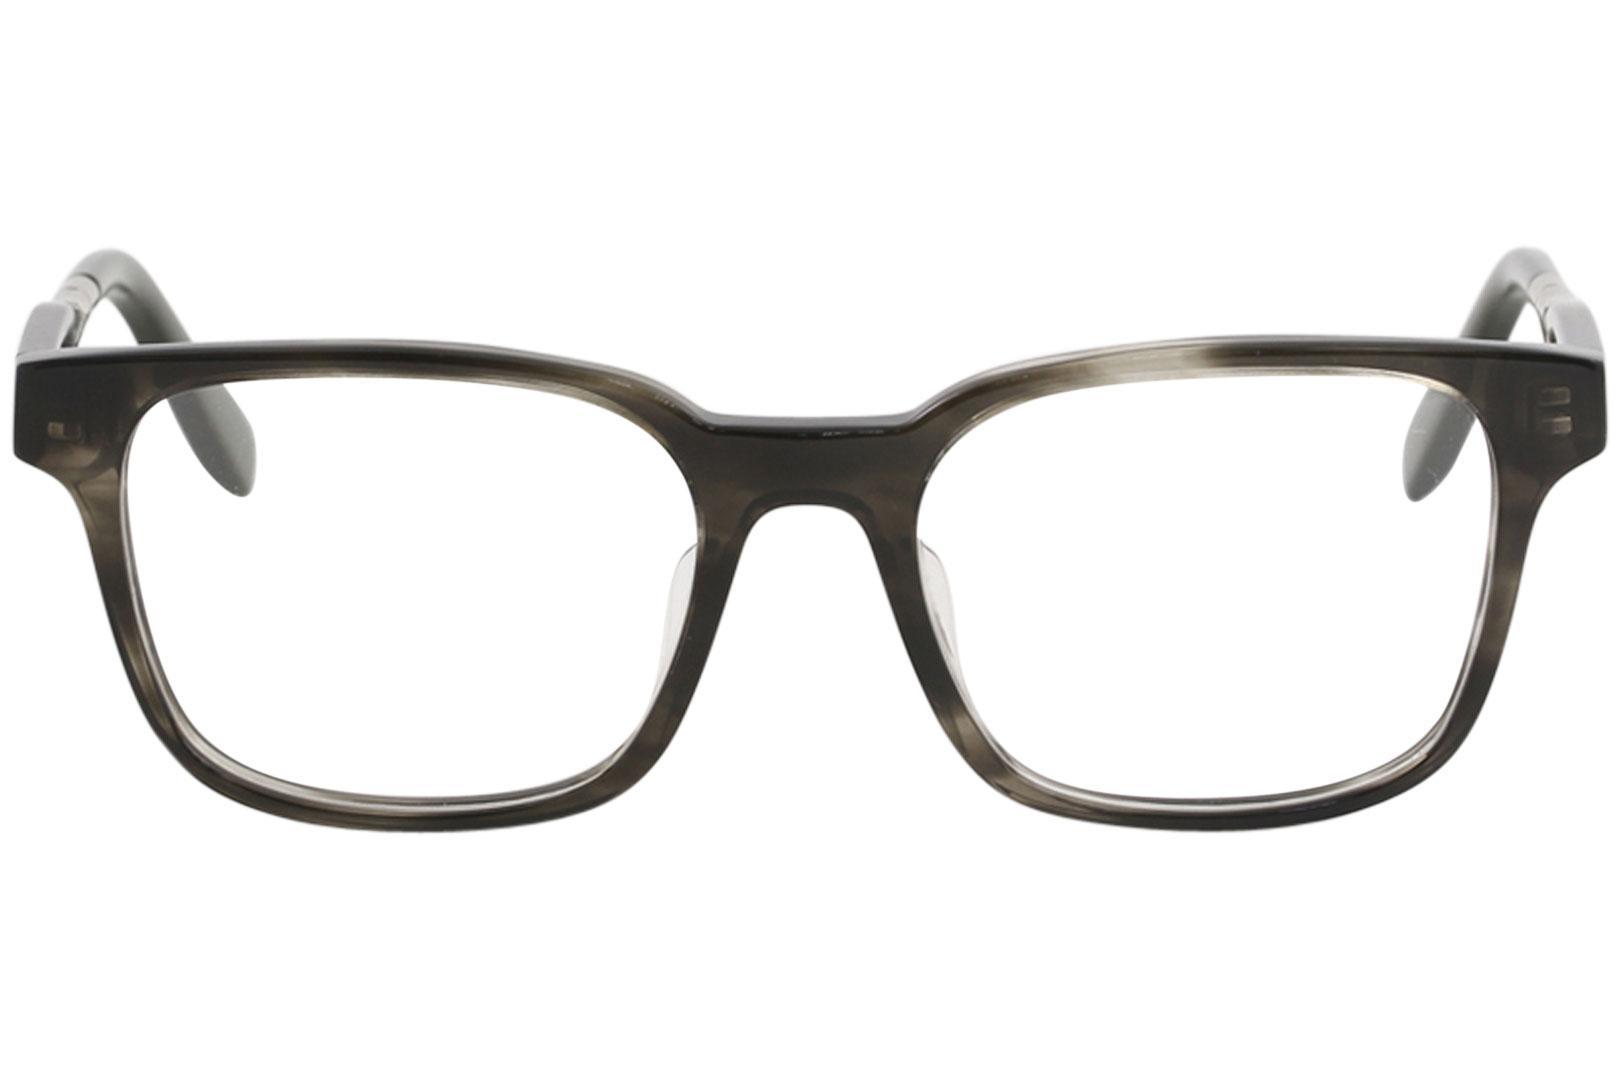 608787b72bb Salvatore Ferragamo Men s Eyeglasses SF2787 SF 2787 Full Rim Optical Frame  by Salvatore Ferragamo. 12345